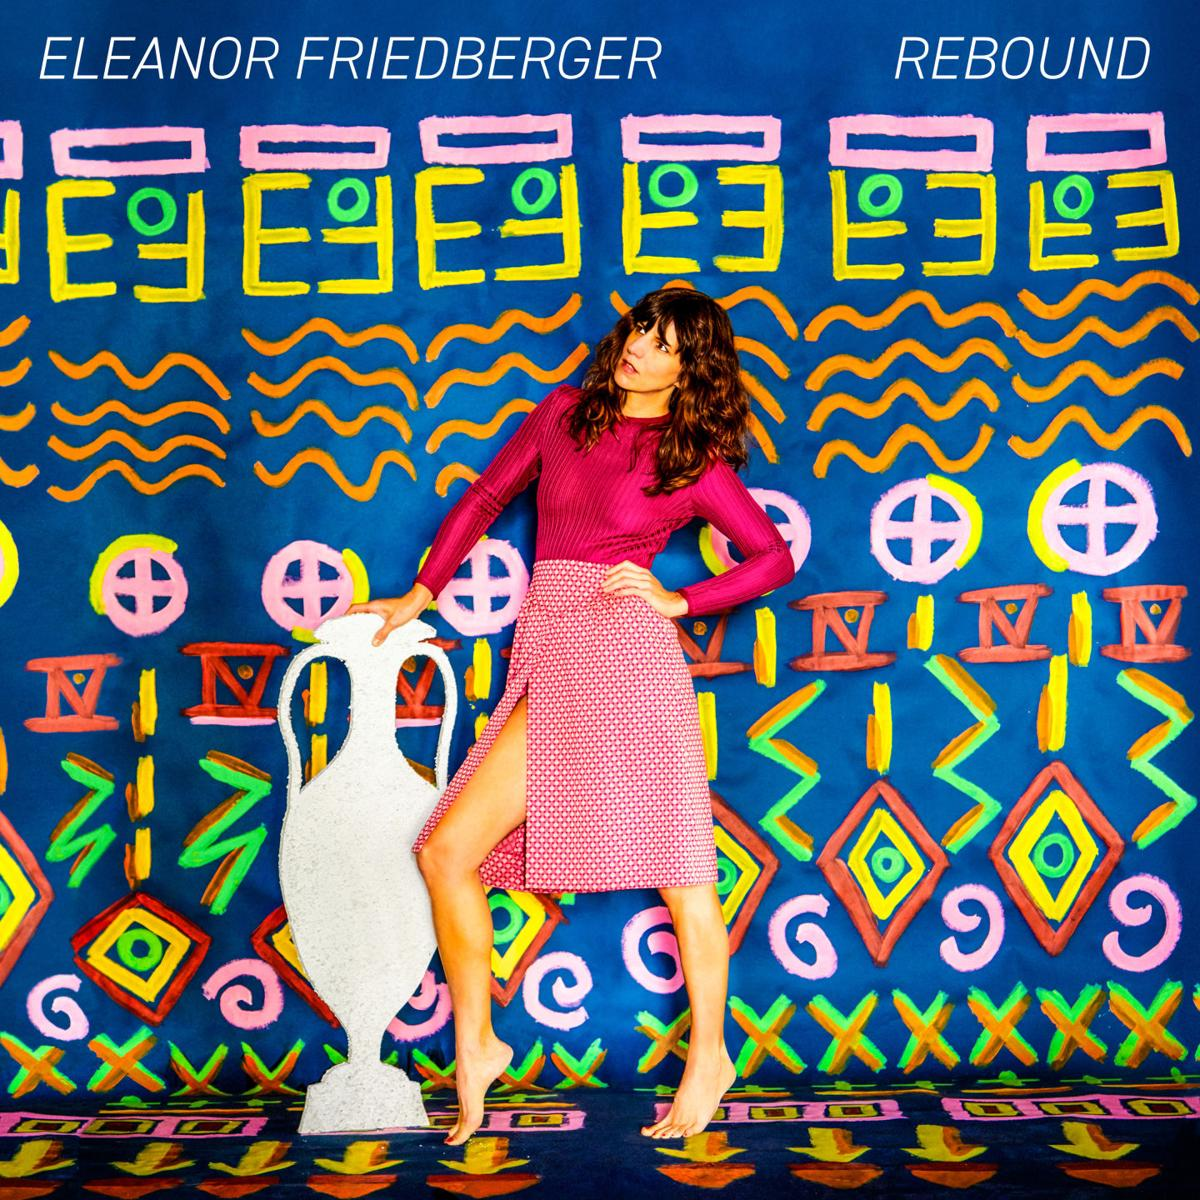 Eleanor Friedberger 'Rebound' for Red